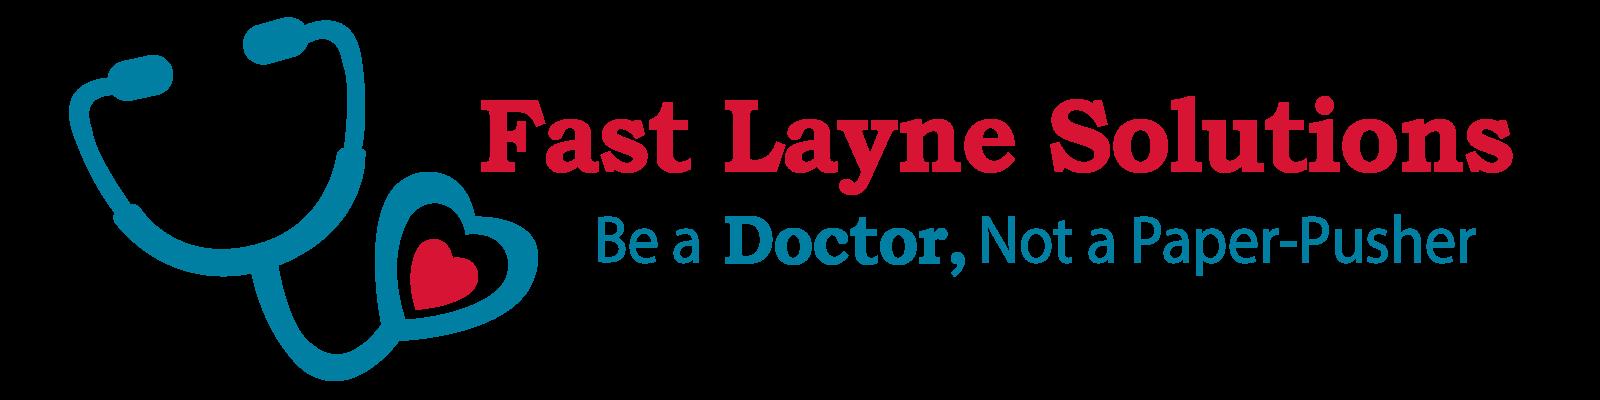 Fast Layne Solutions Logo